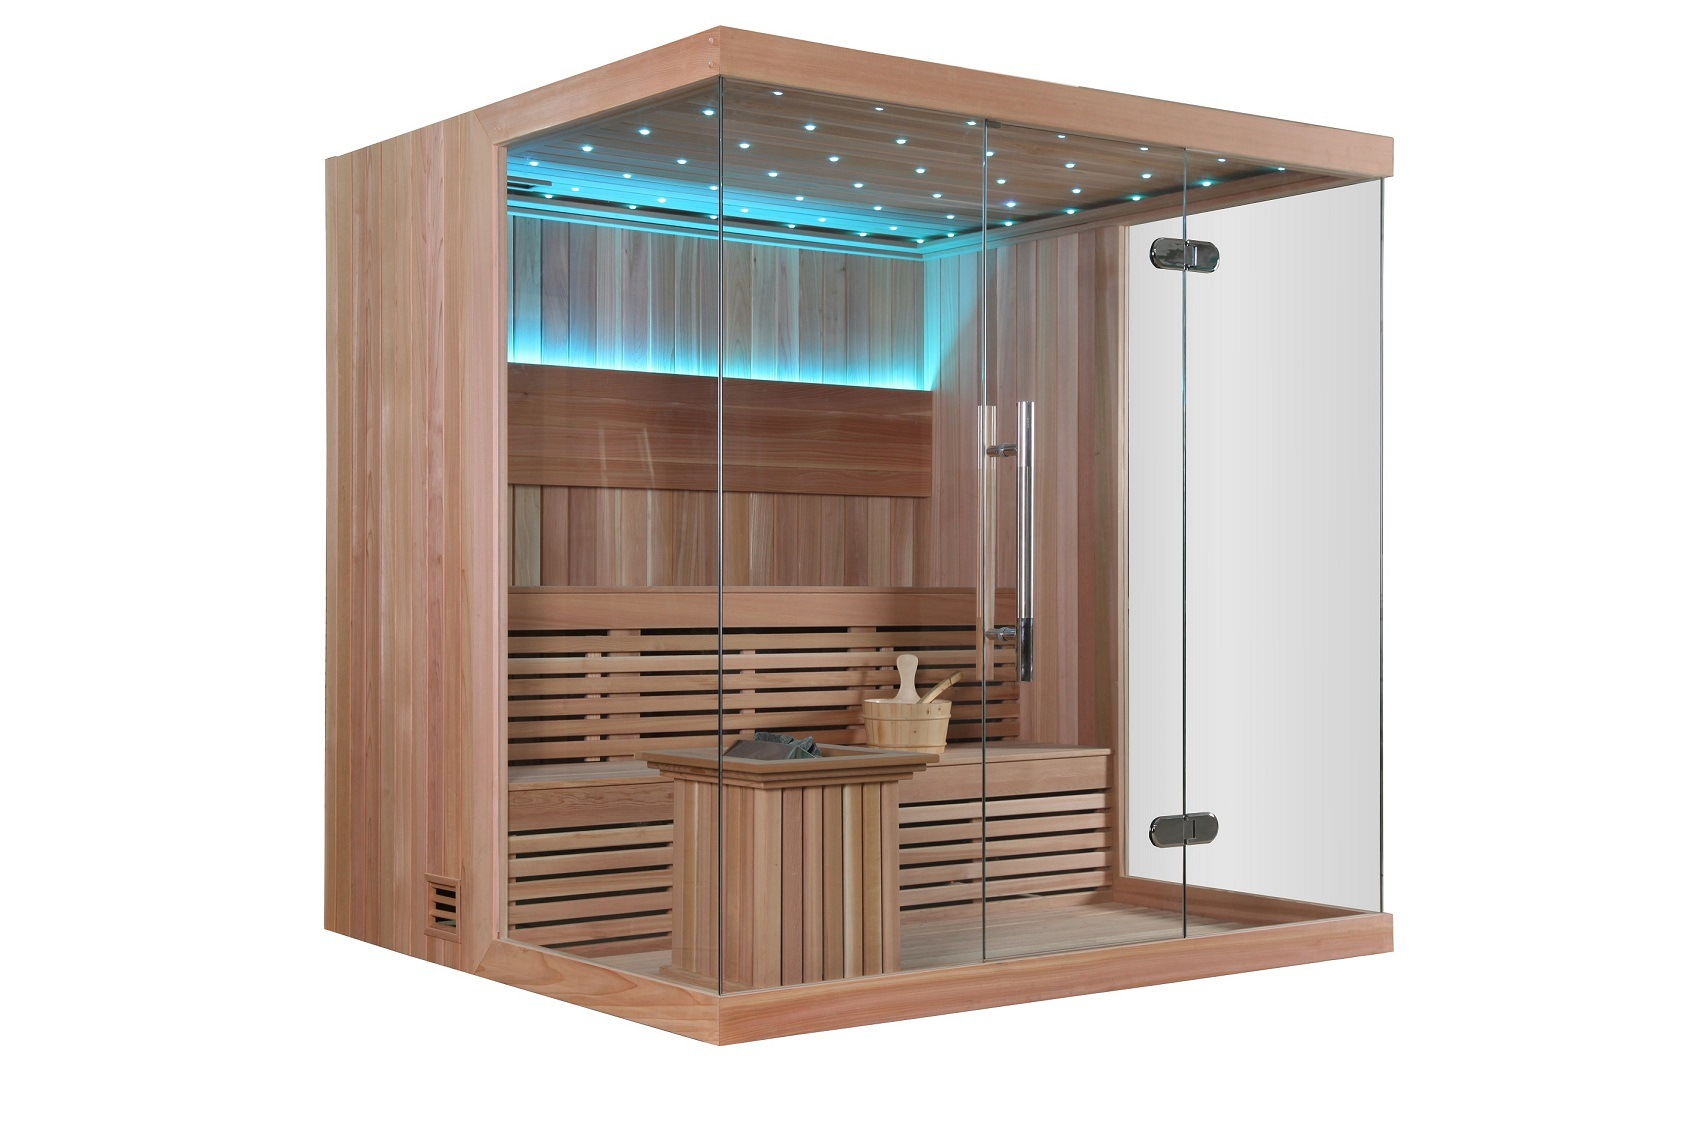 Foto de Sauna seca de Monalisa com madeira importada para a venda M  #2190AA 1685x1124